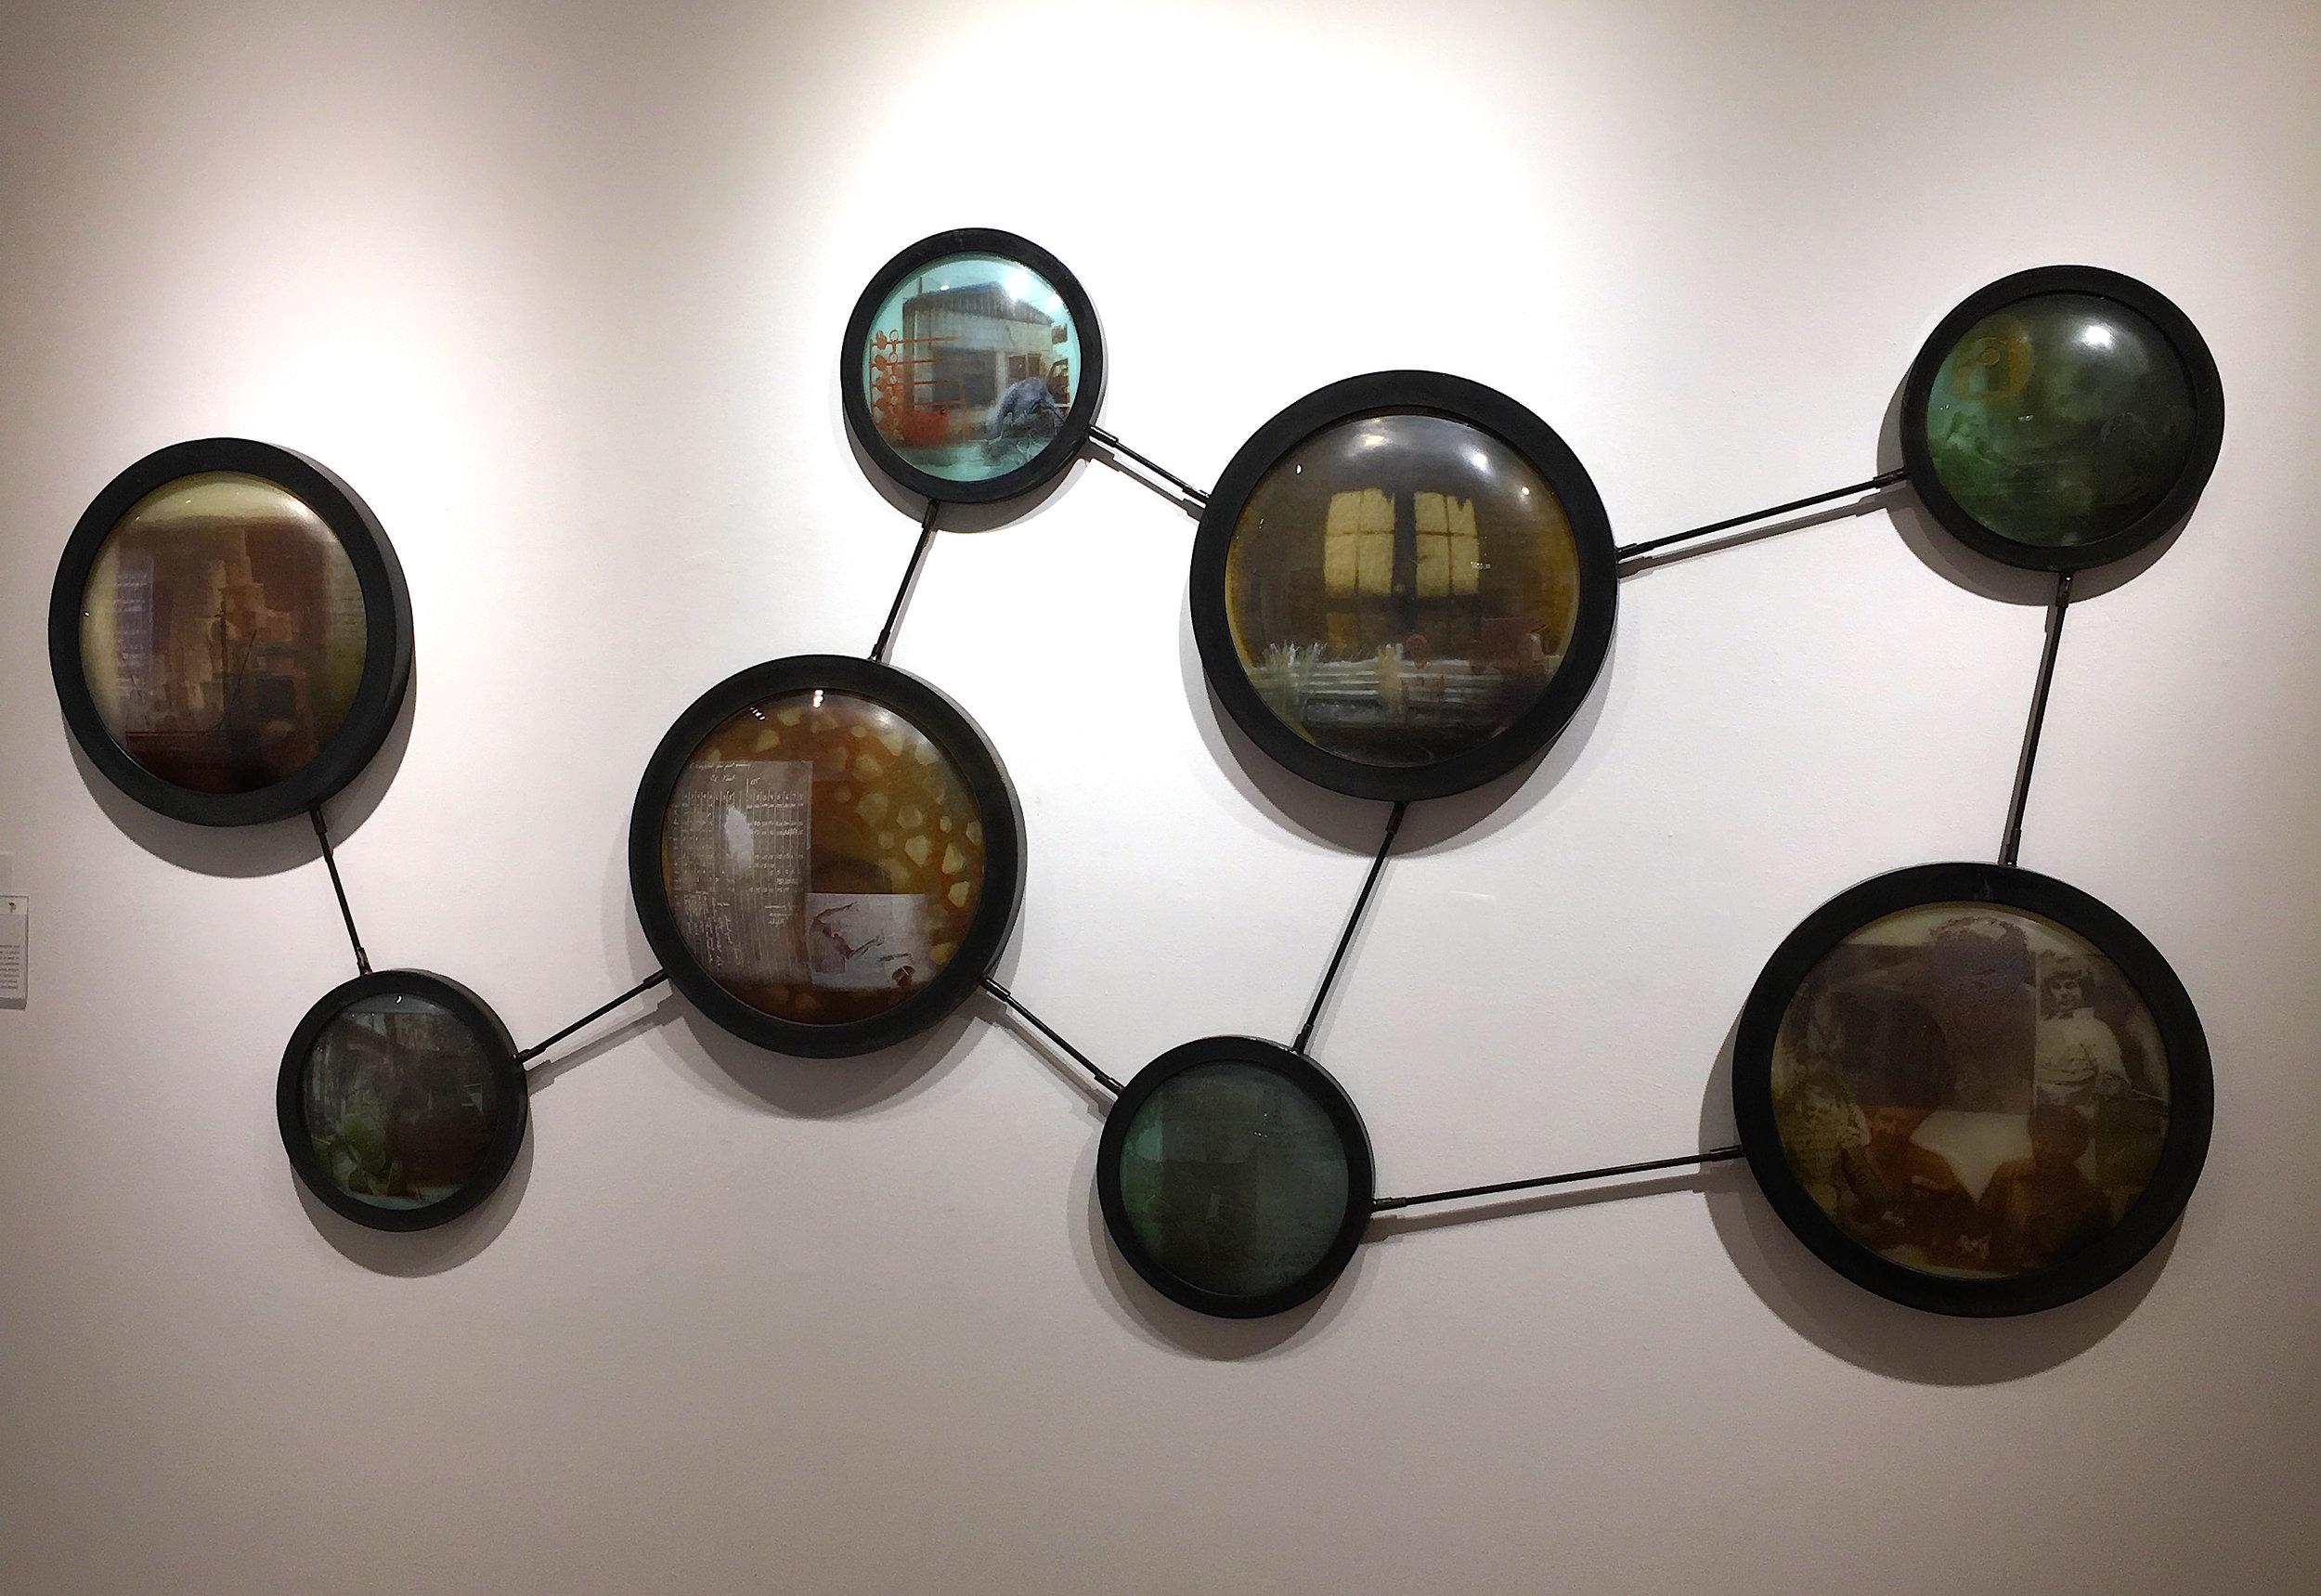 Hayden Wilson, The Molecule, 2017, blown glass with glass powder screen prints